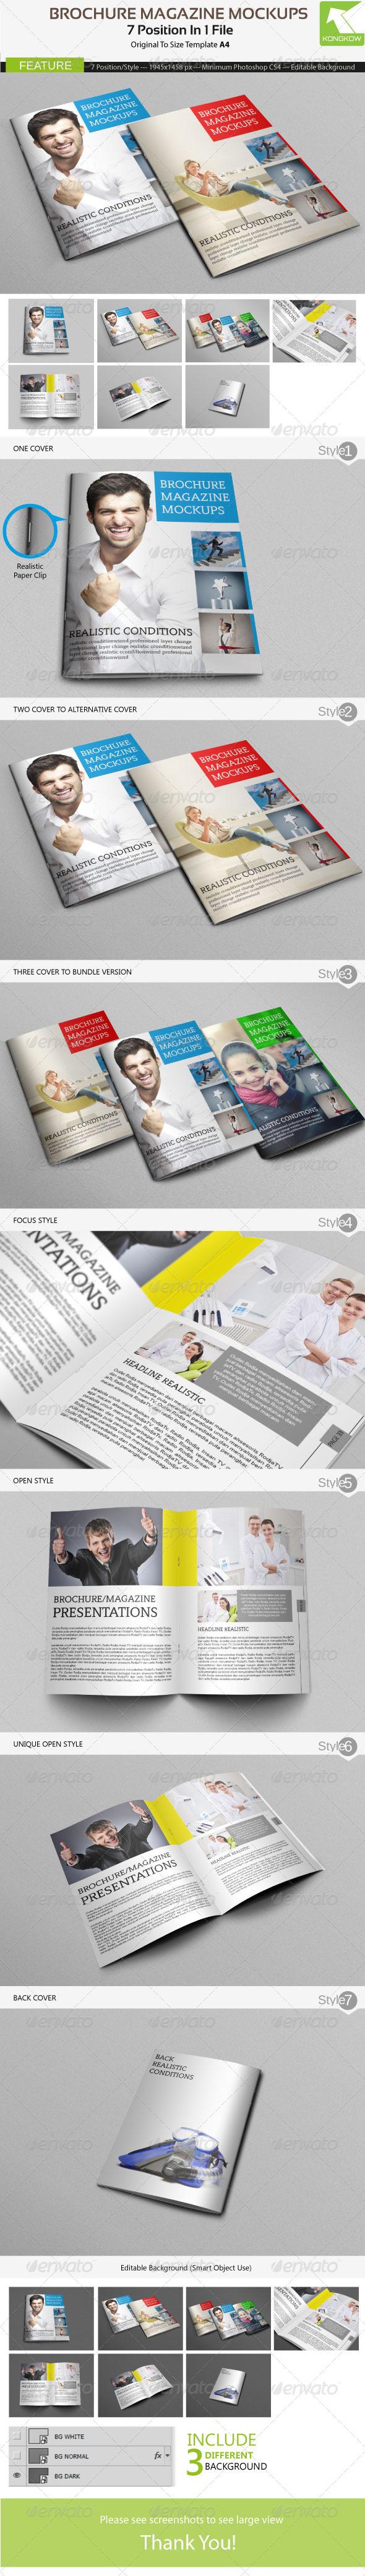 GraphicRiver Brochure Magazine Mockups 4562355